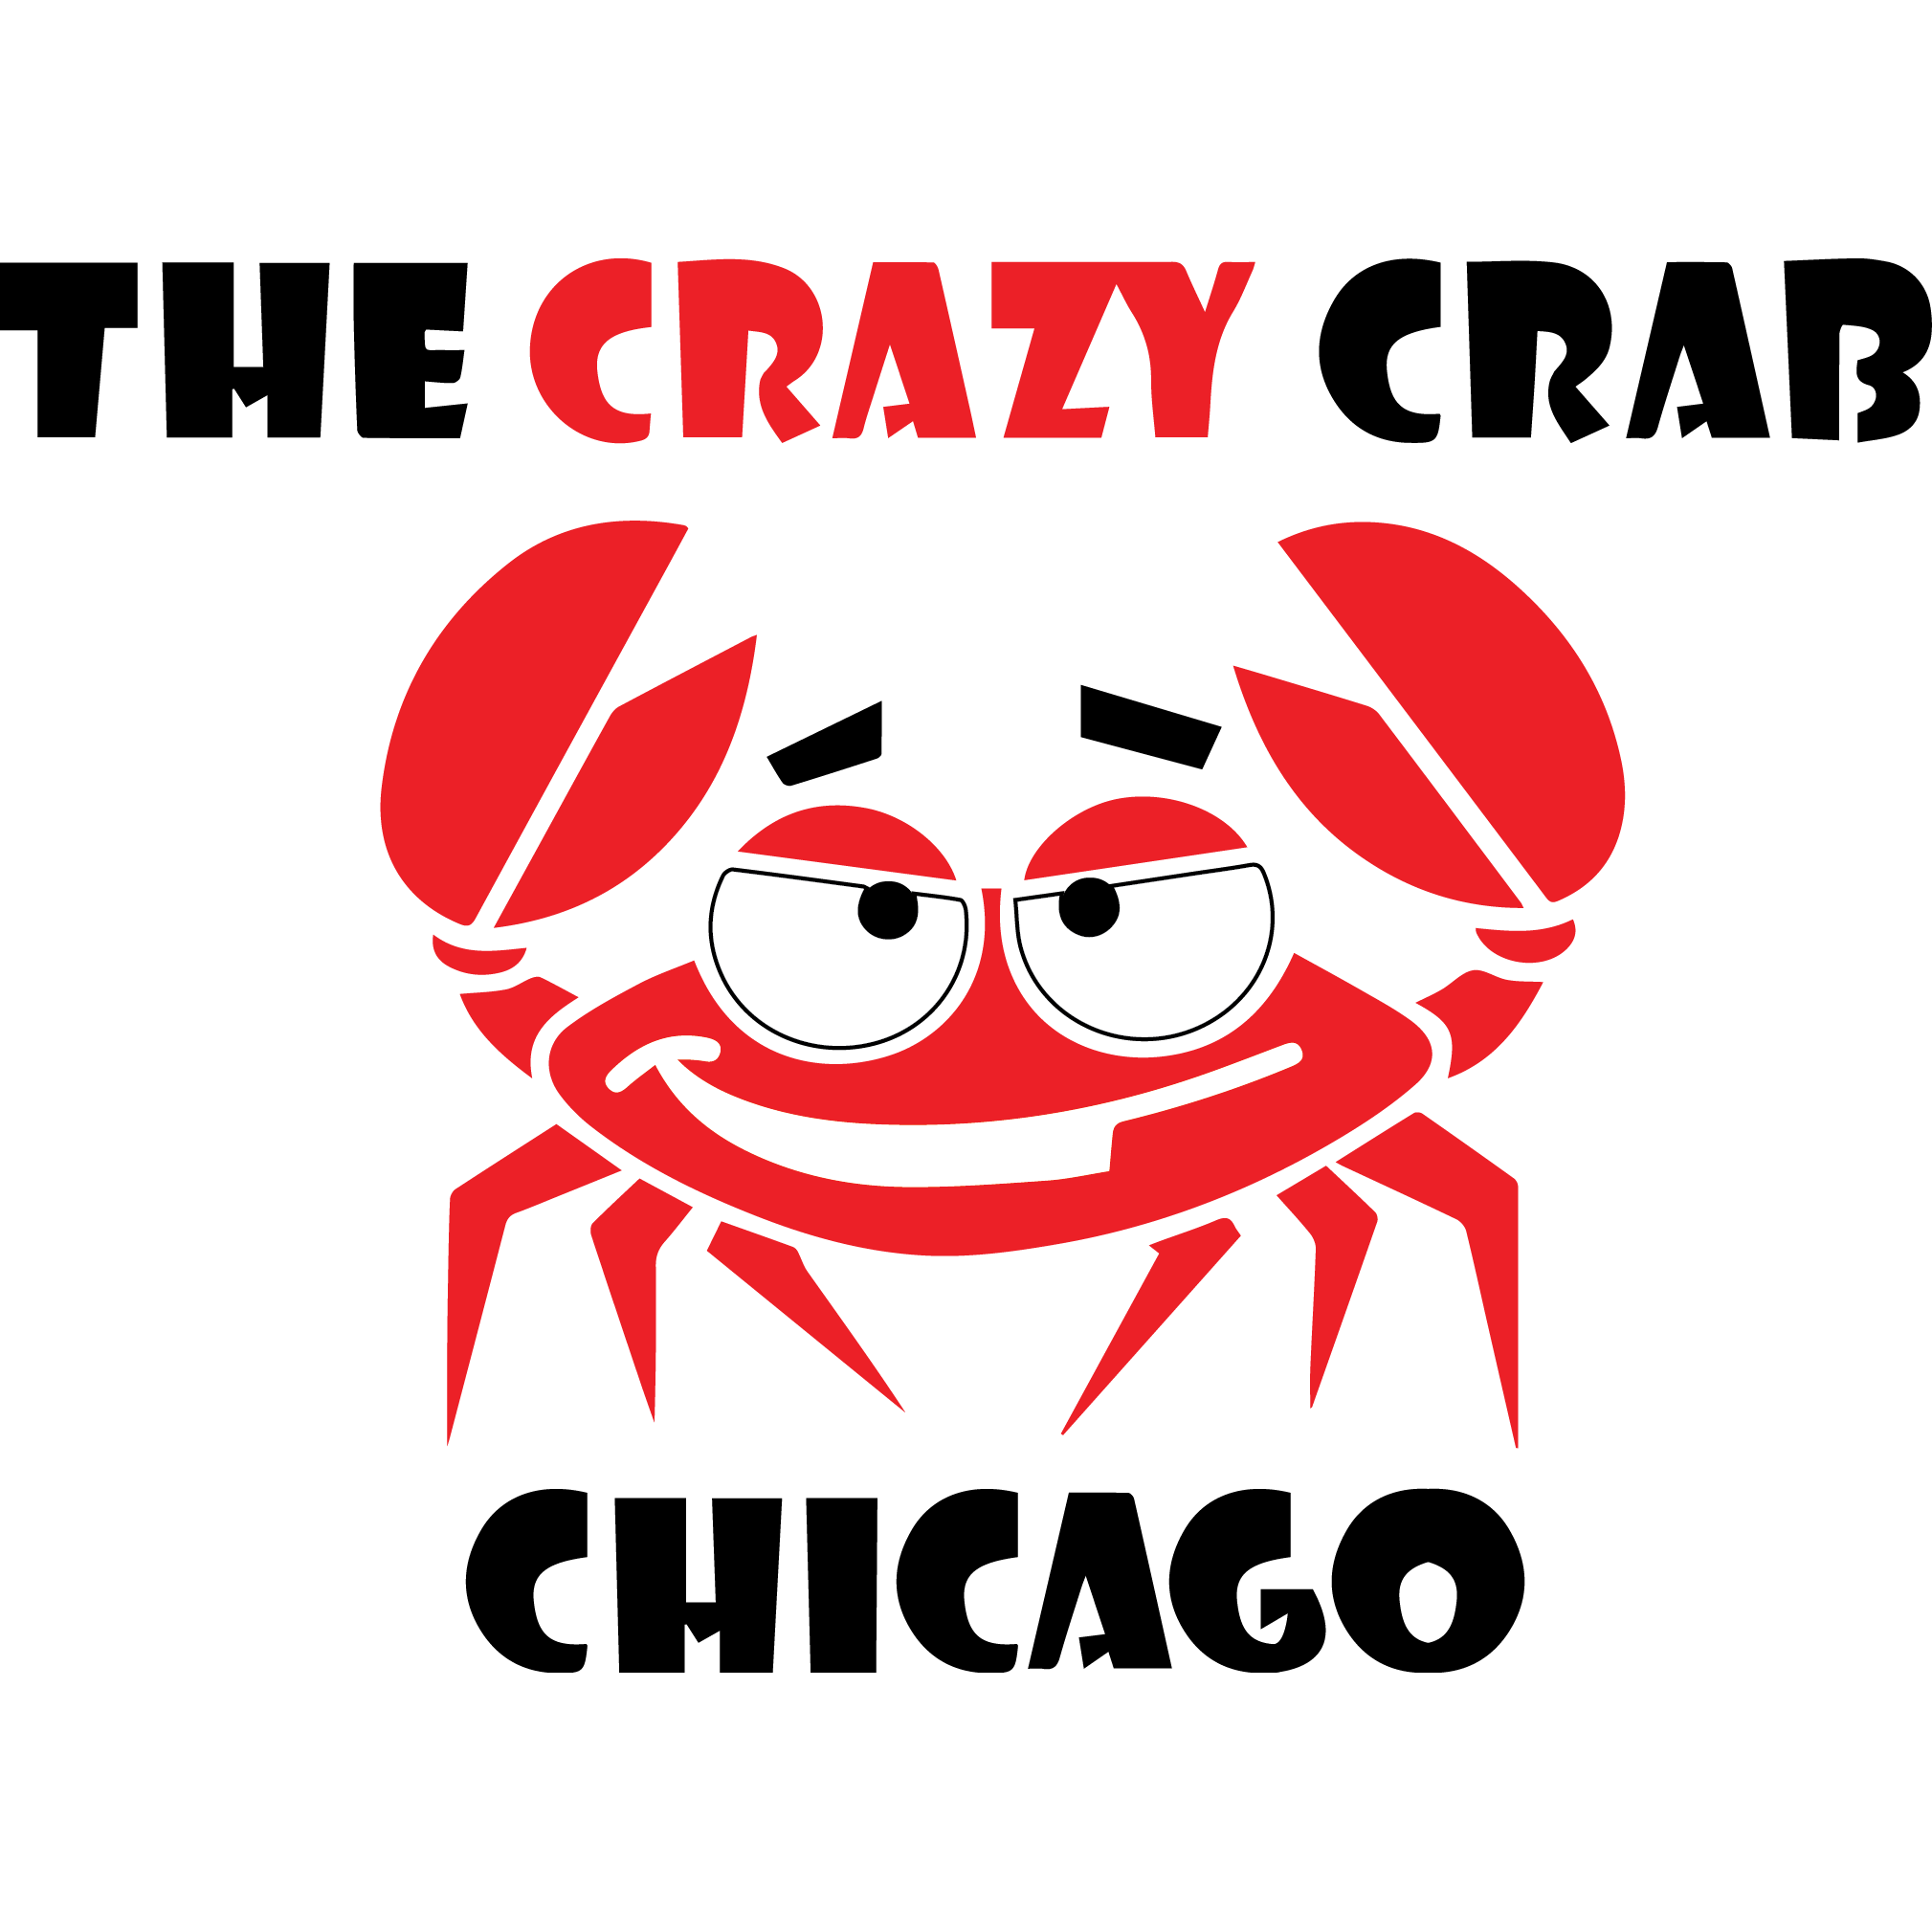 The Crazy Crab Chicago image 2